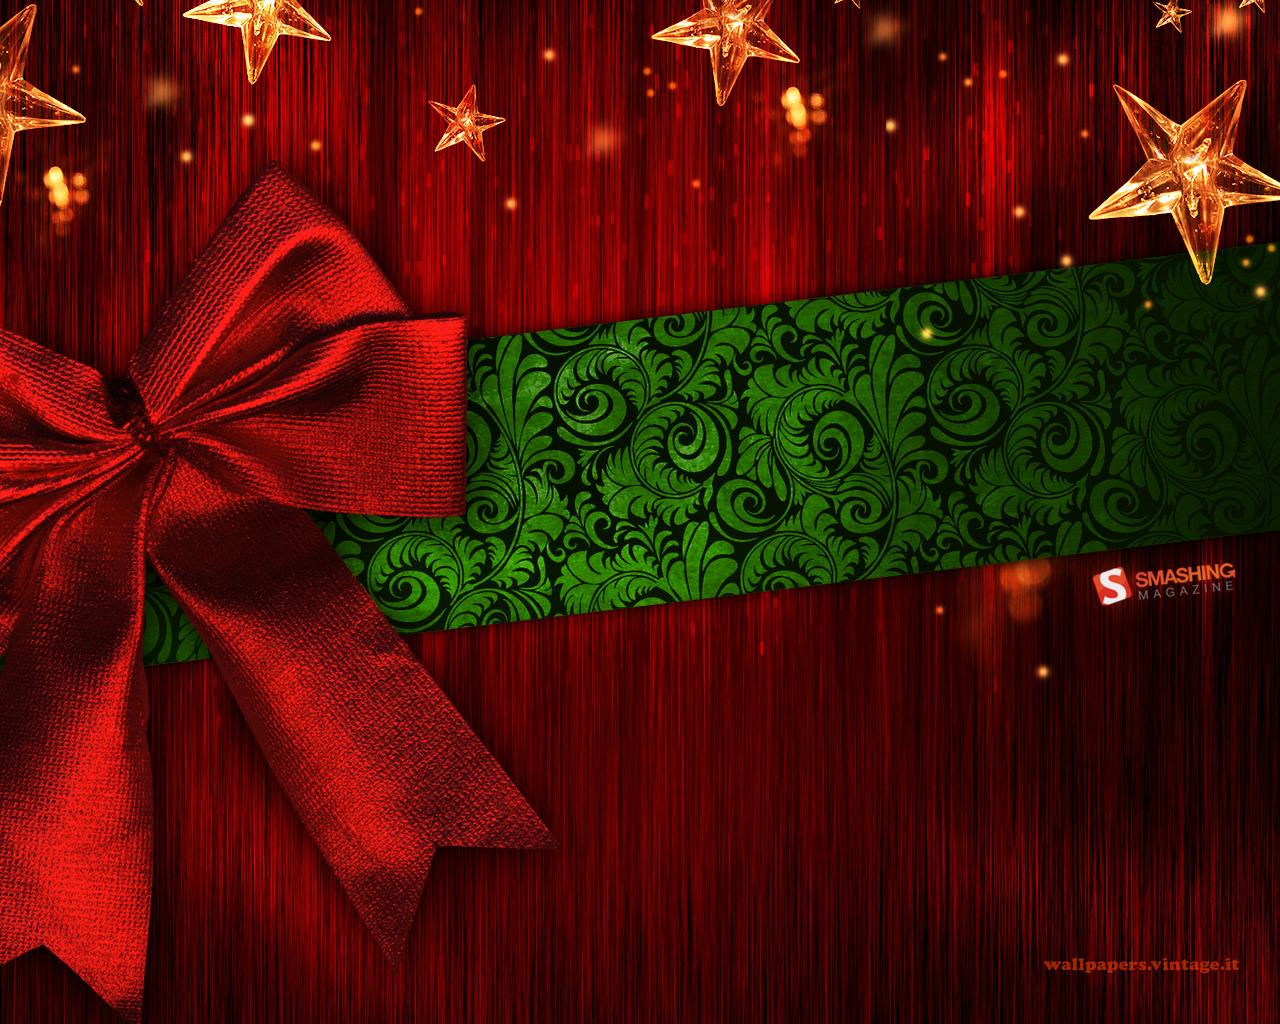 Christmas cards 2012 christmas wallpaper stripes stars background christmas wallpaper stripes stars background m4hsunfo